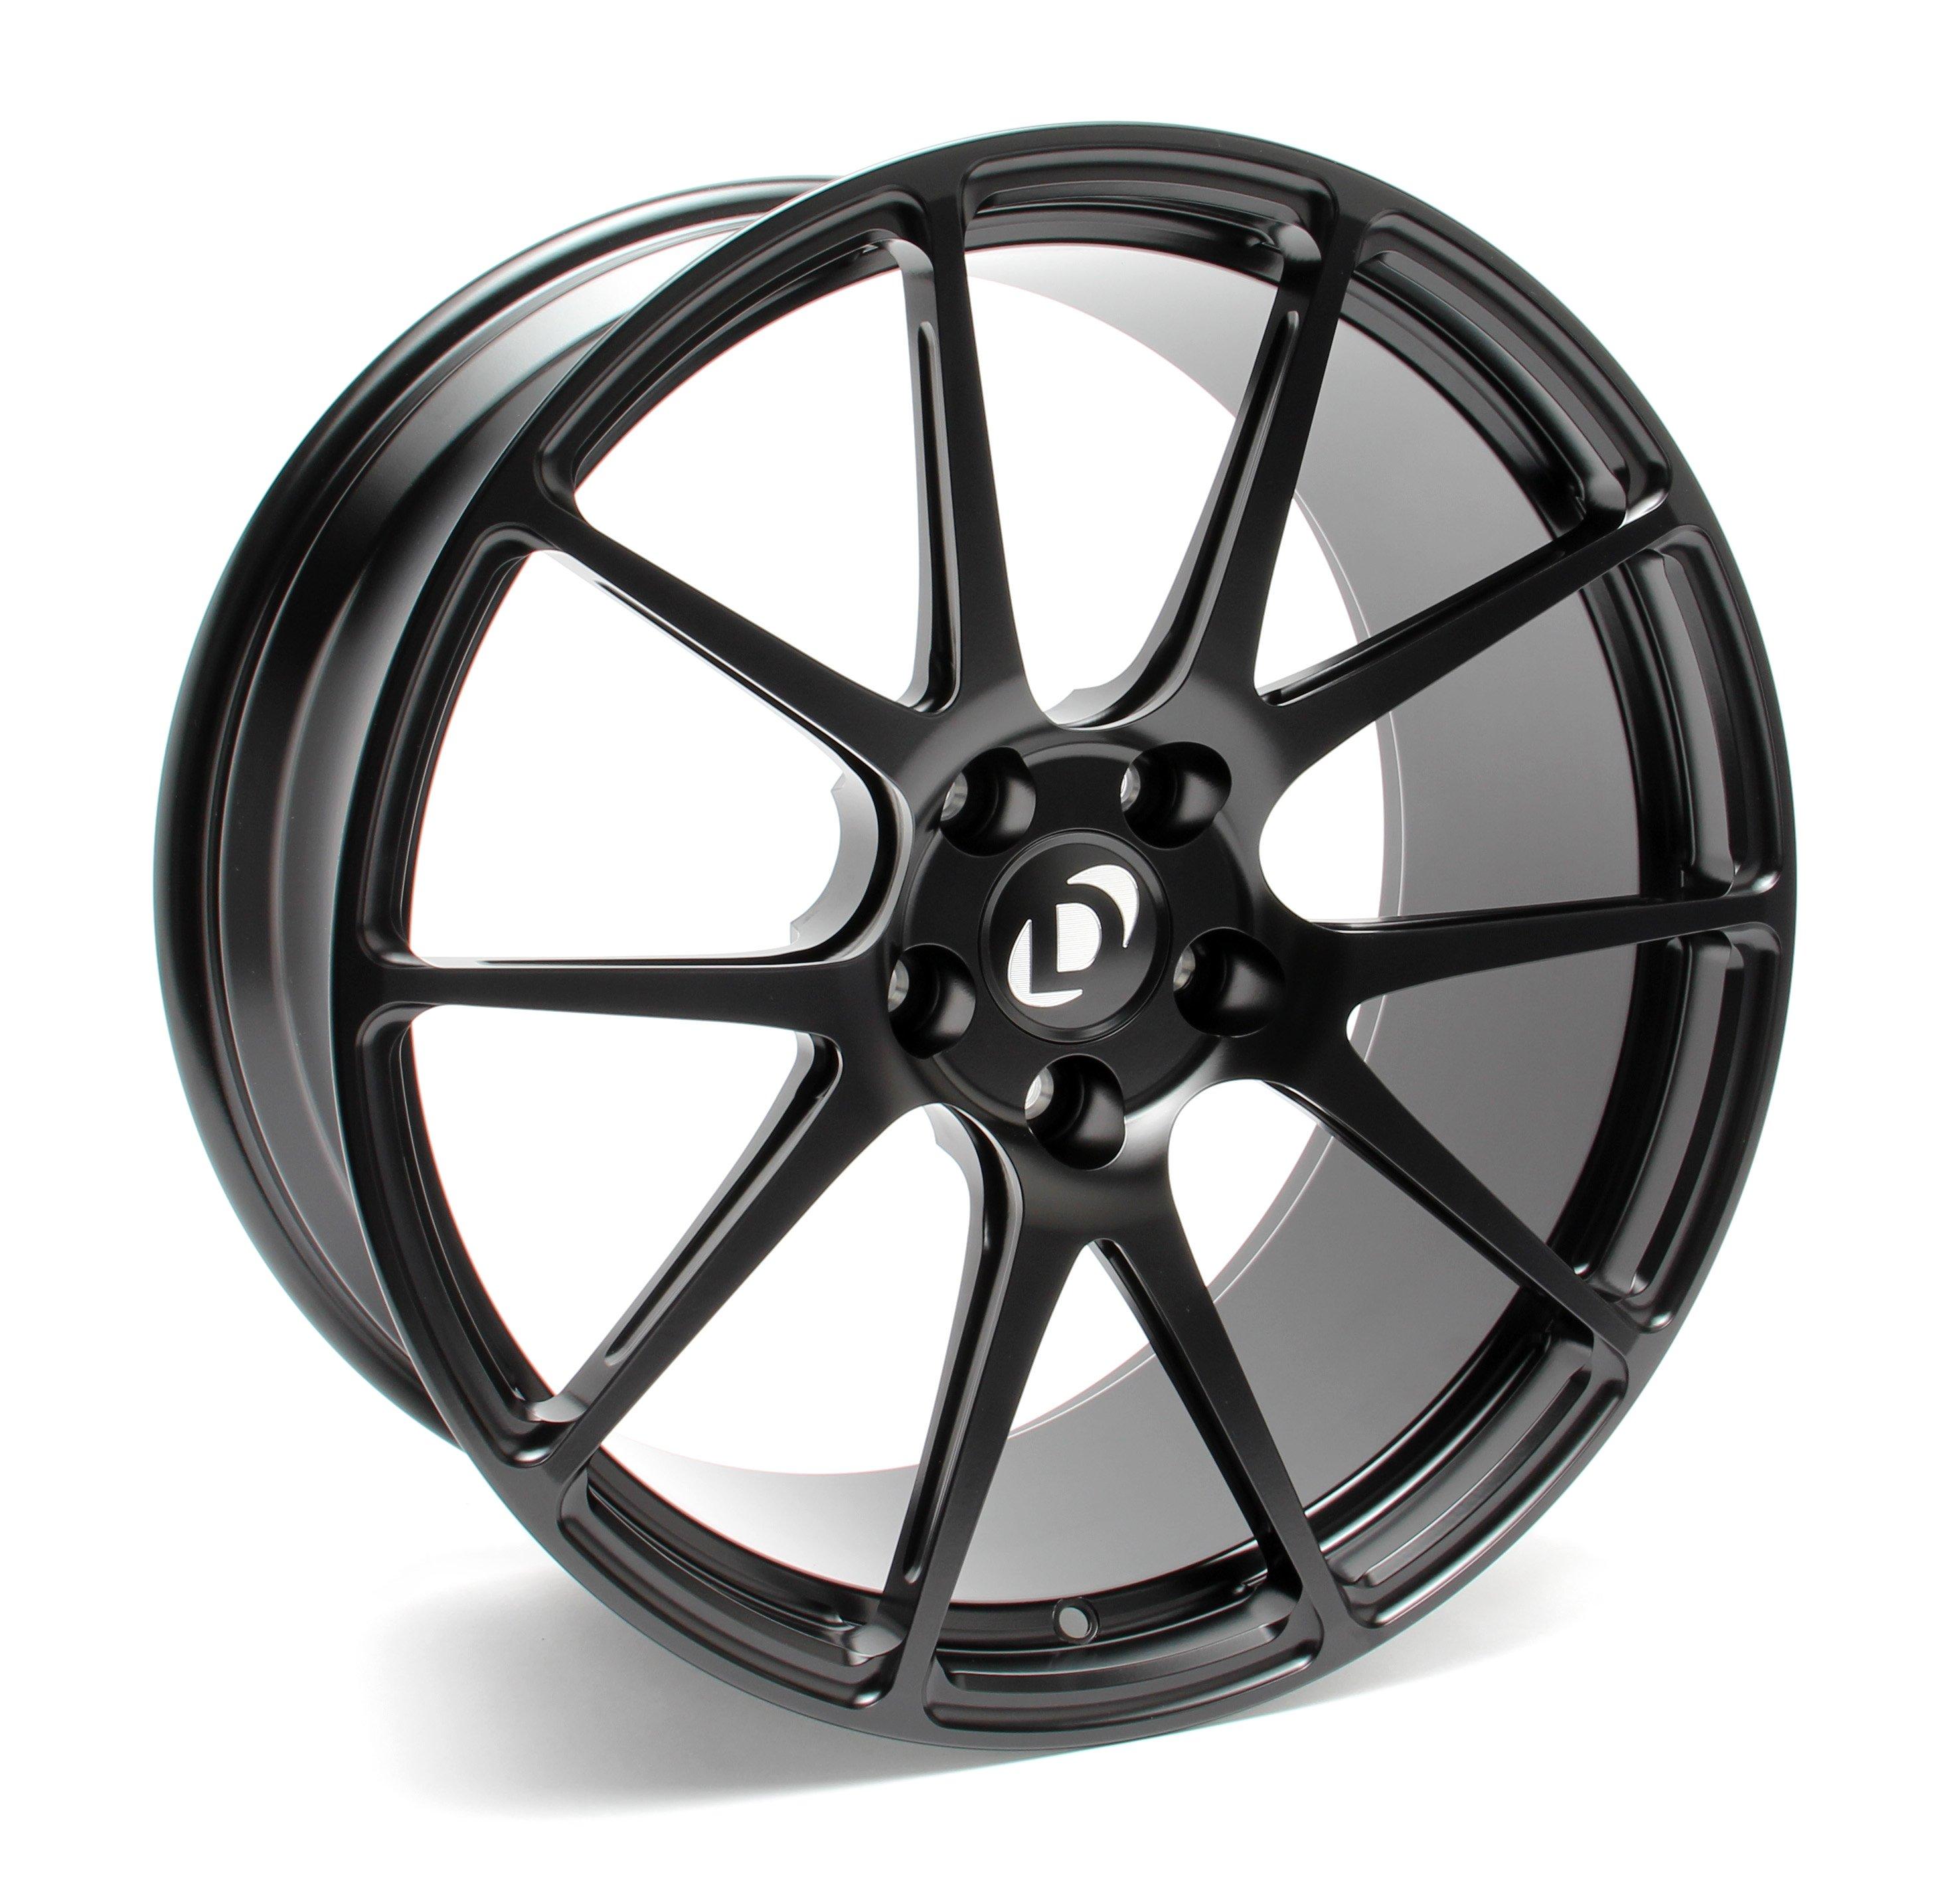 Dinan D750 0069 Ga1r Blk Forgeline Ga1r Performance Wheel Set 2004 2010 Bmw 535i 545i 550i 645ci 650i